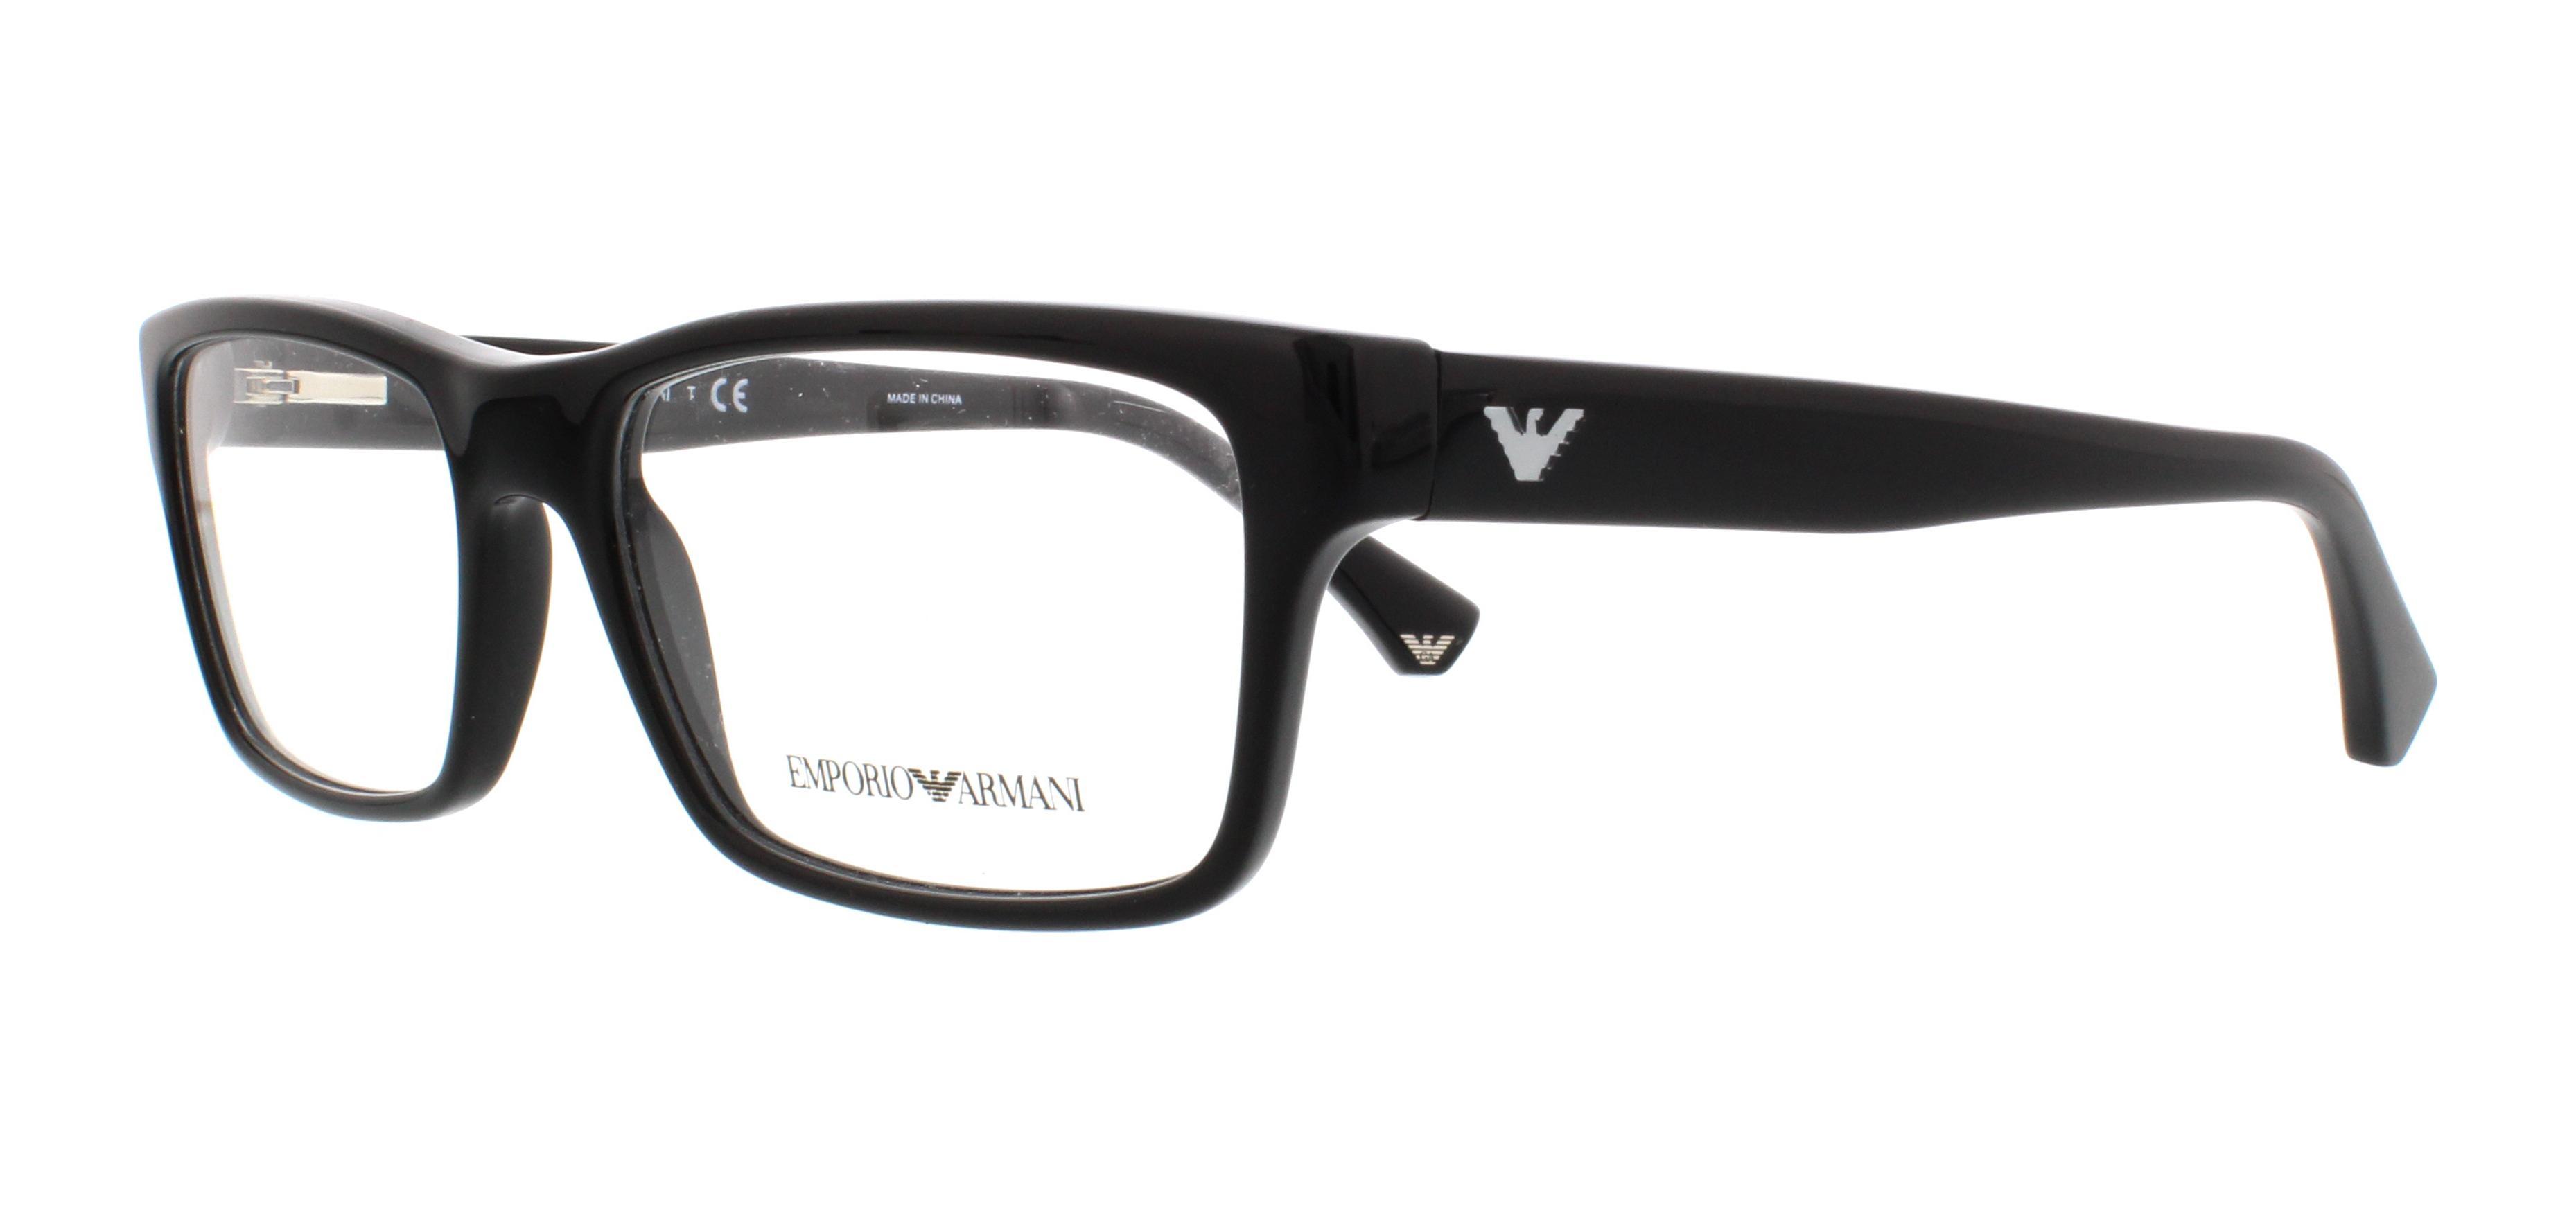 2647aa5404b Emporio Armani Eyeglasses Men. Designer Frames Outlet.